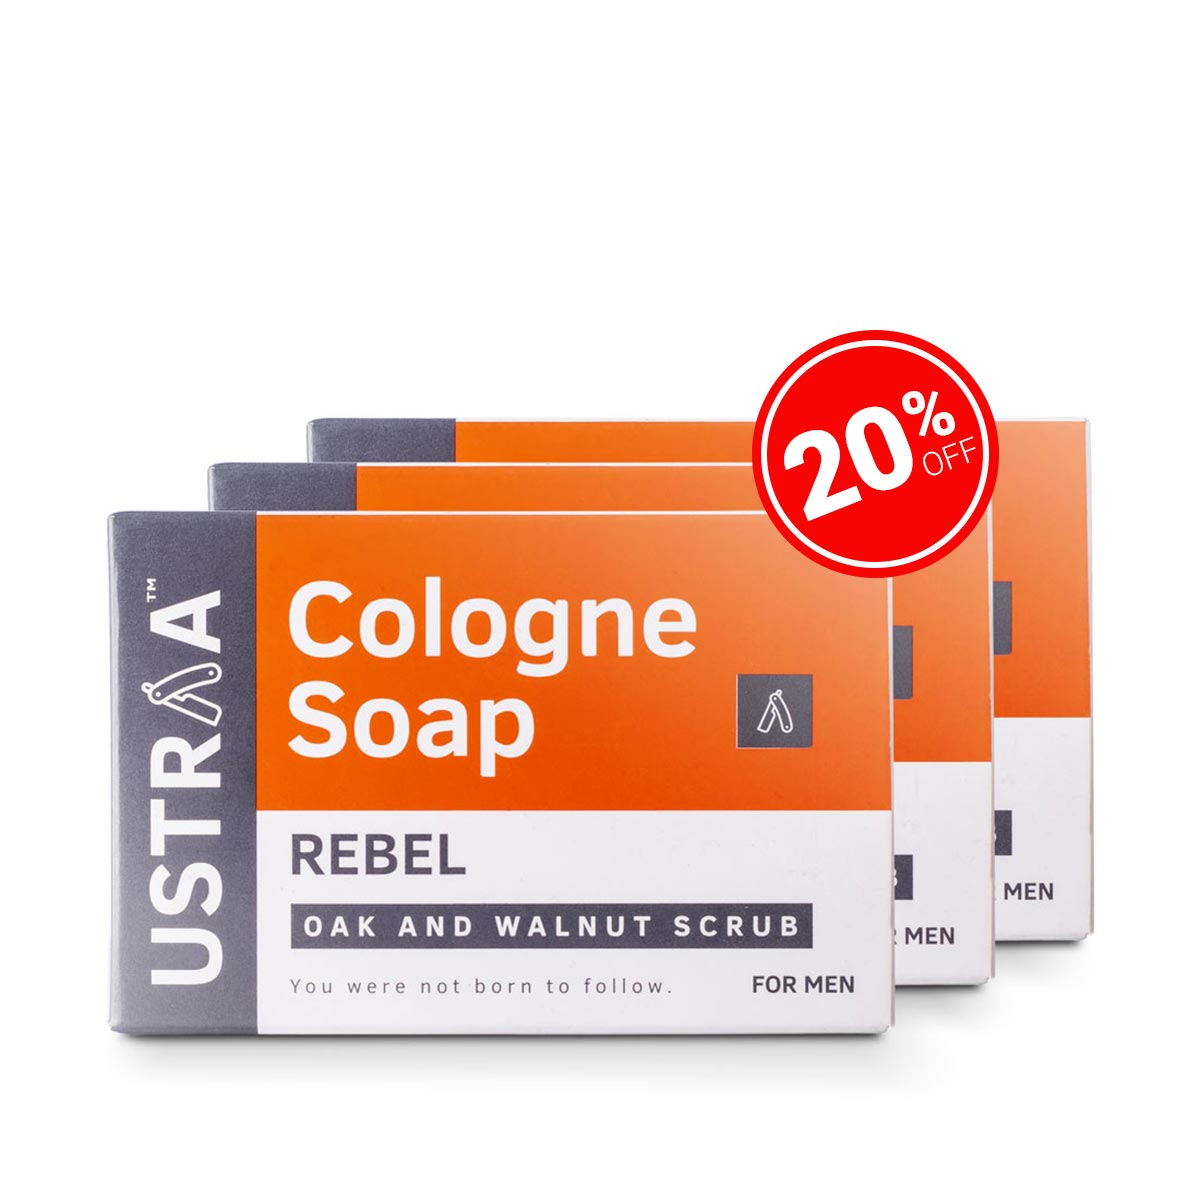 Rebel Cologne Soap - Pack of 3